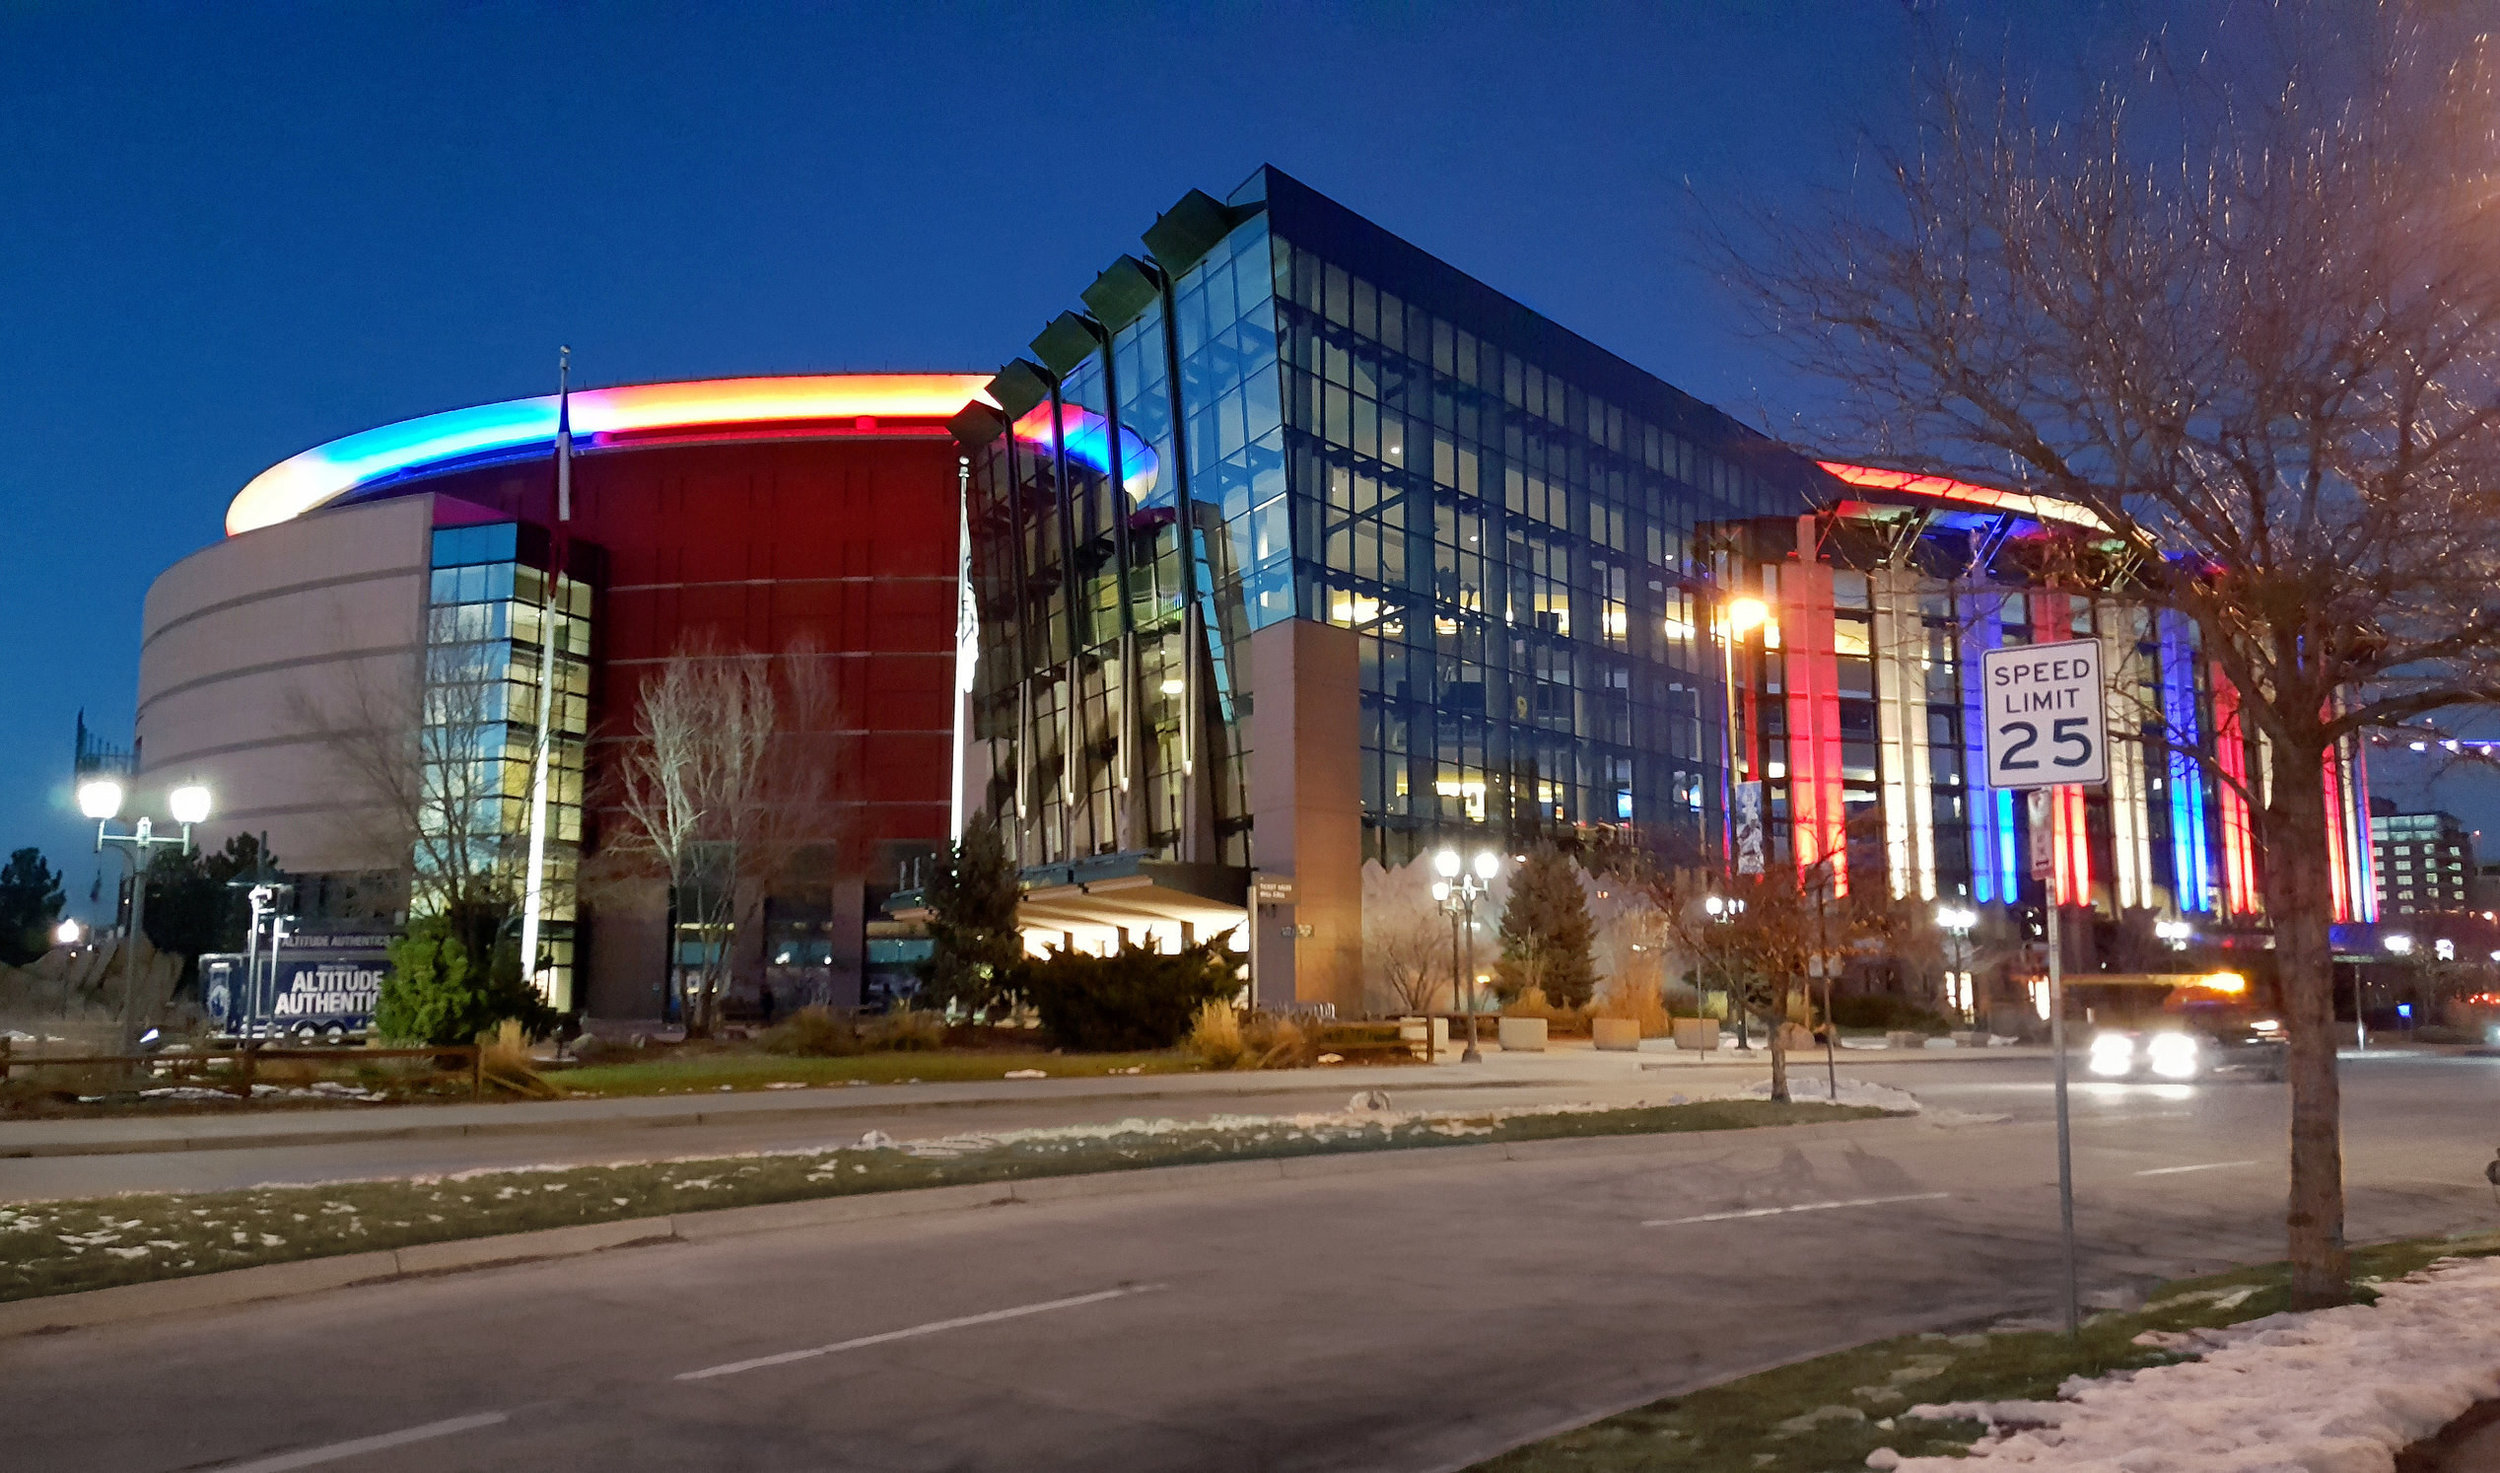 Award of Merit - Pepsi Center Exterior Lighting EnhancementsMichael Lindey - HLB Lighting Design